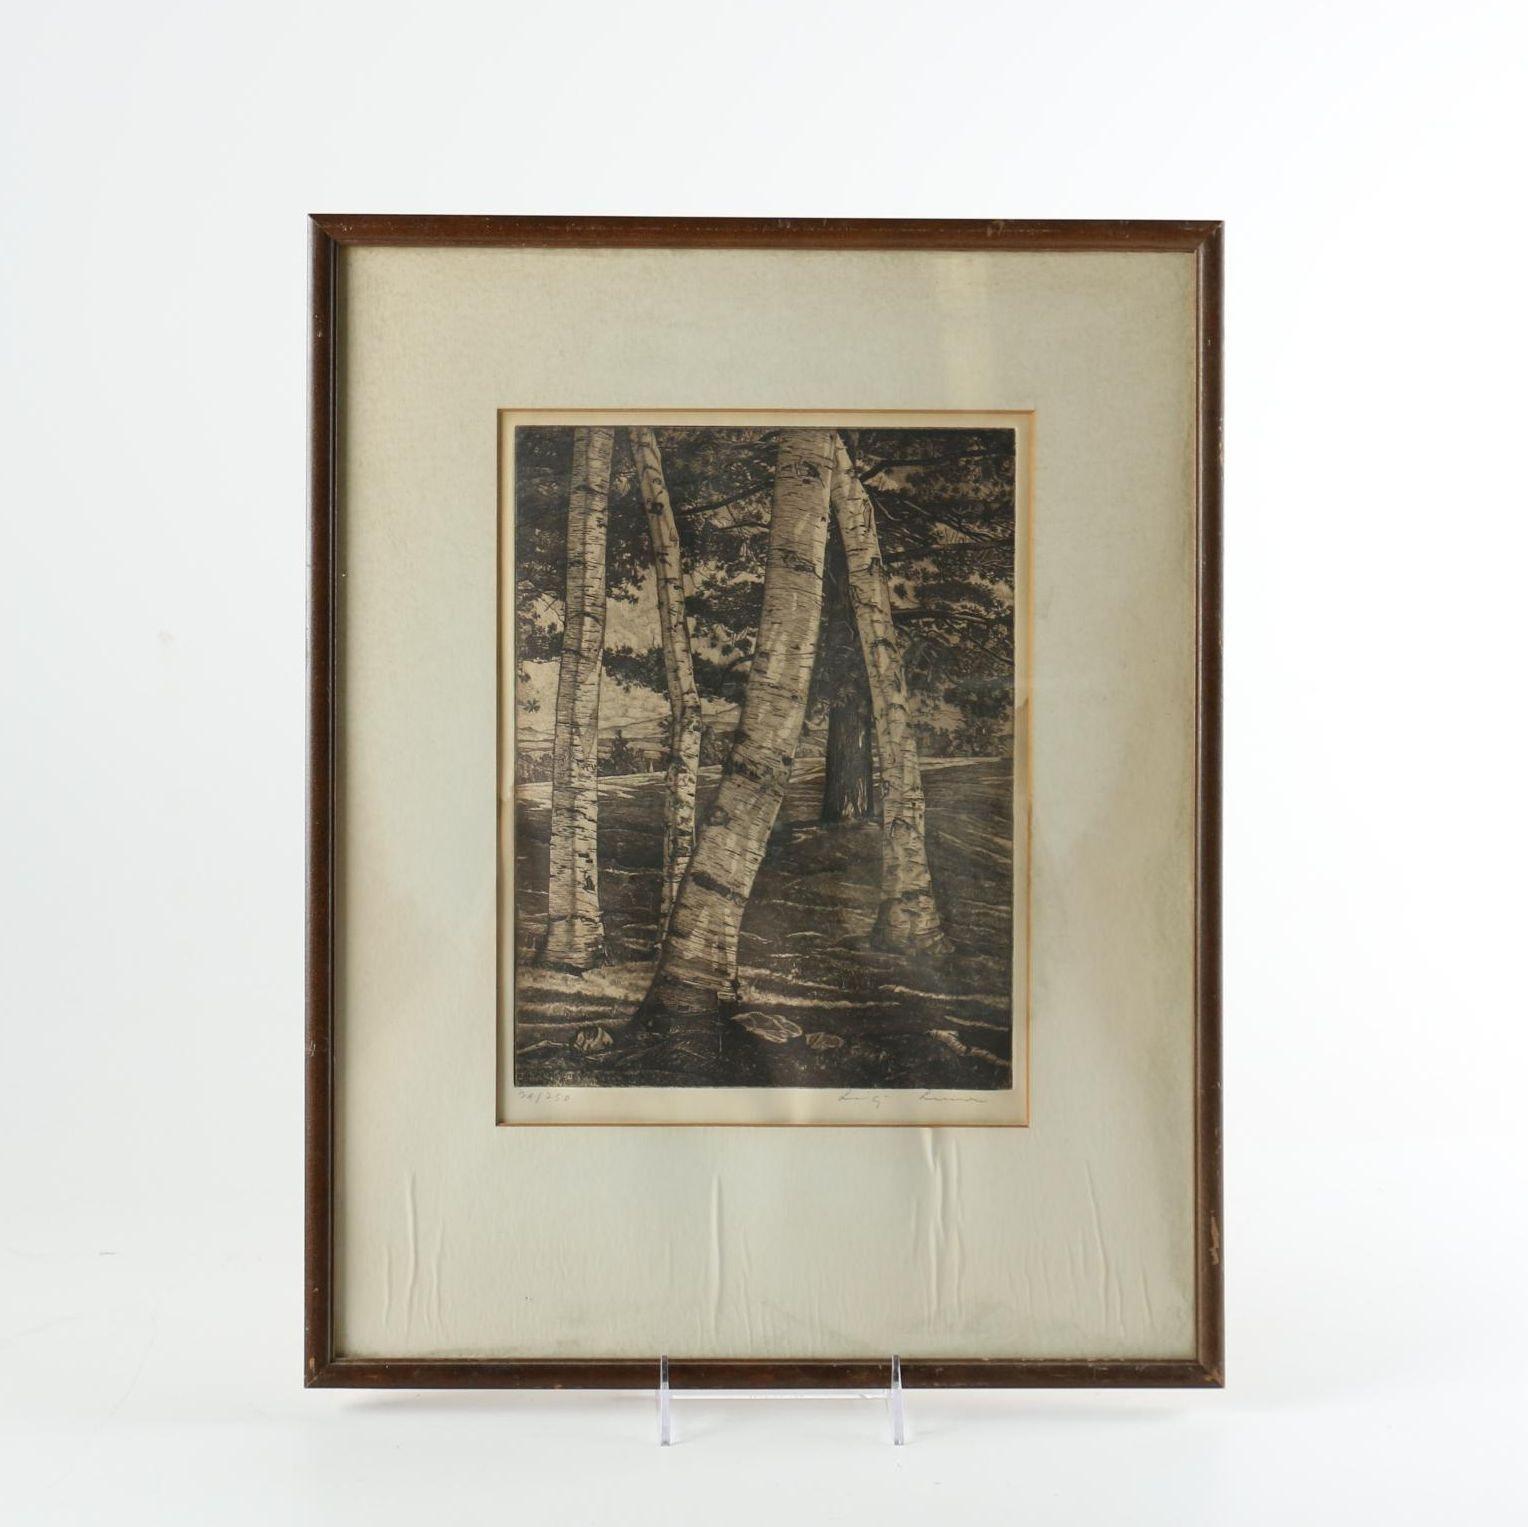 Luigi Lucioni Limited Edition Etching of Birch Trees